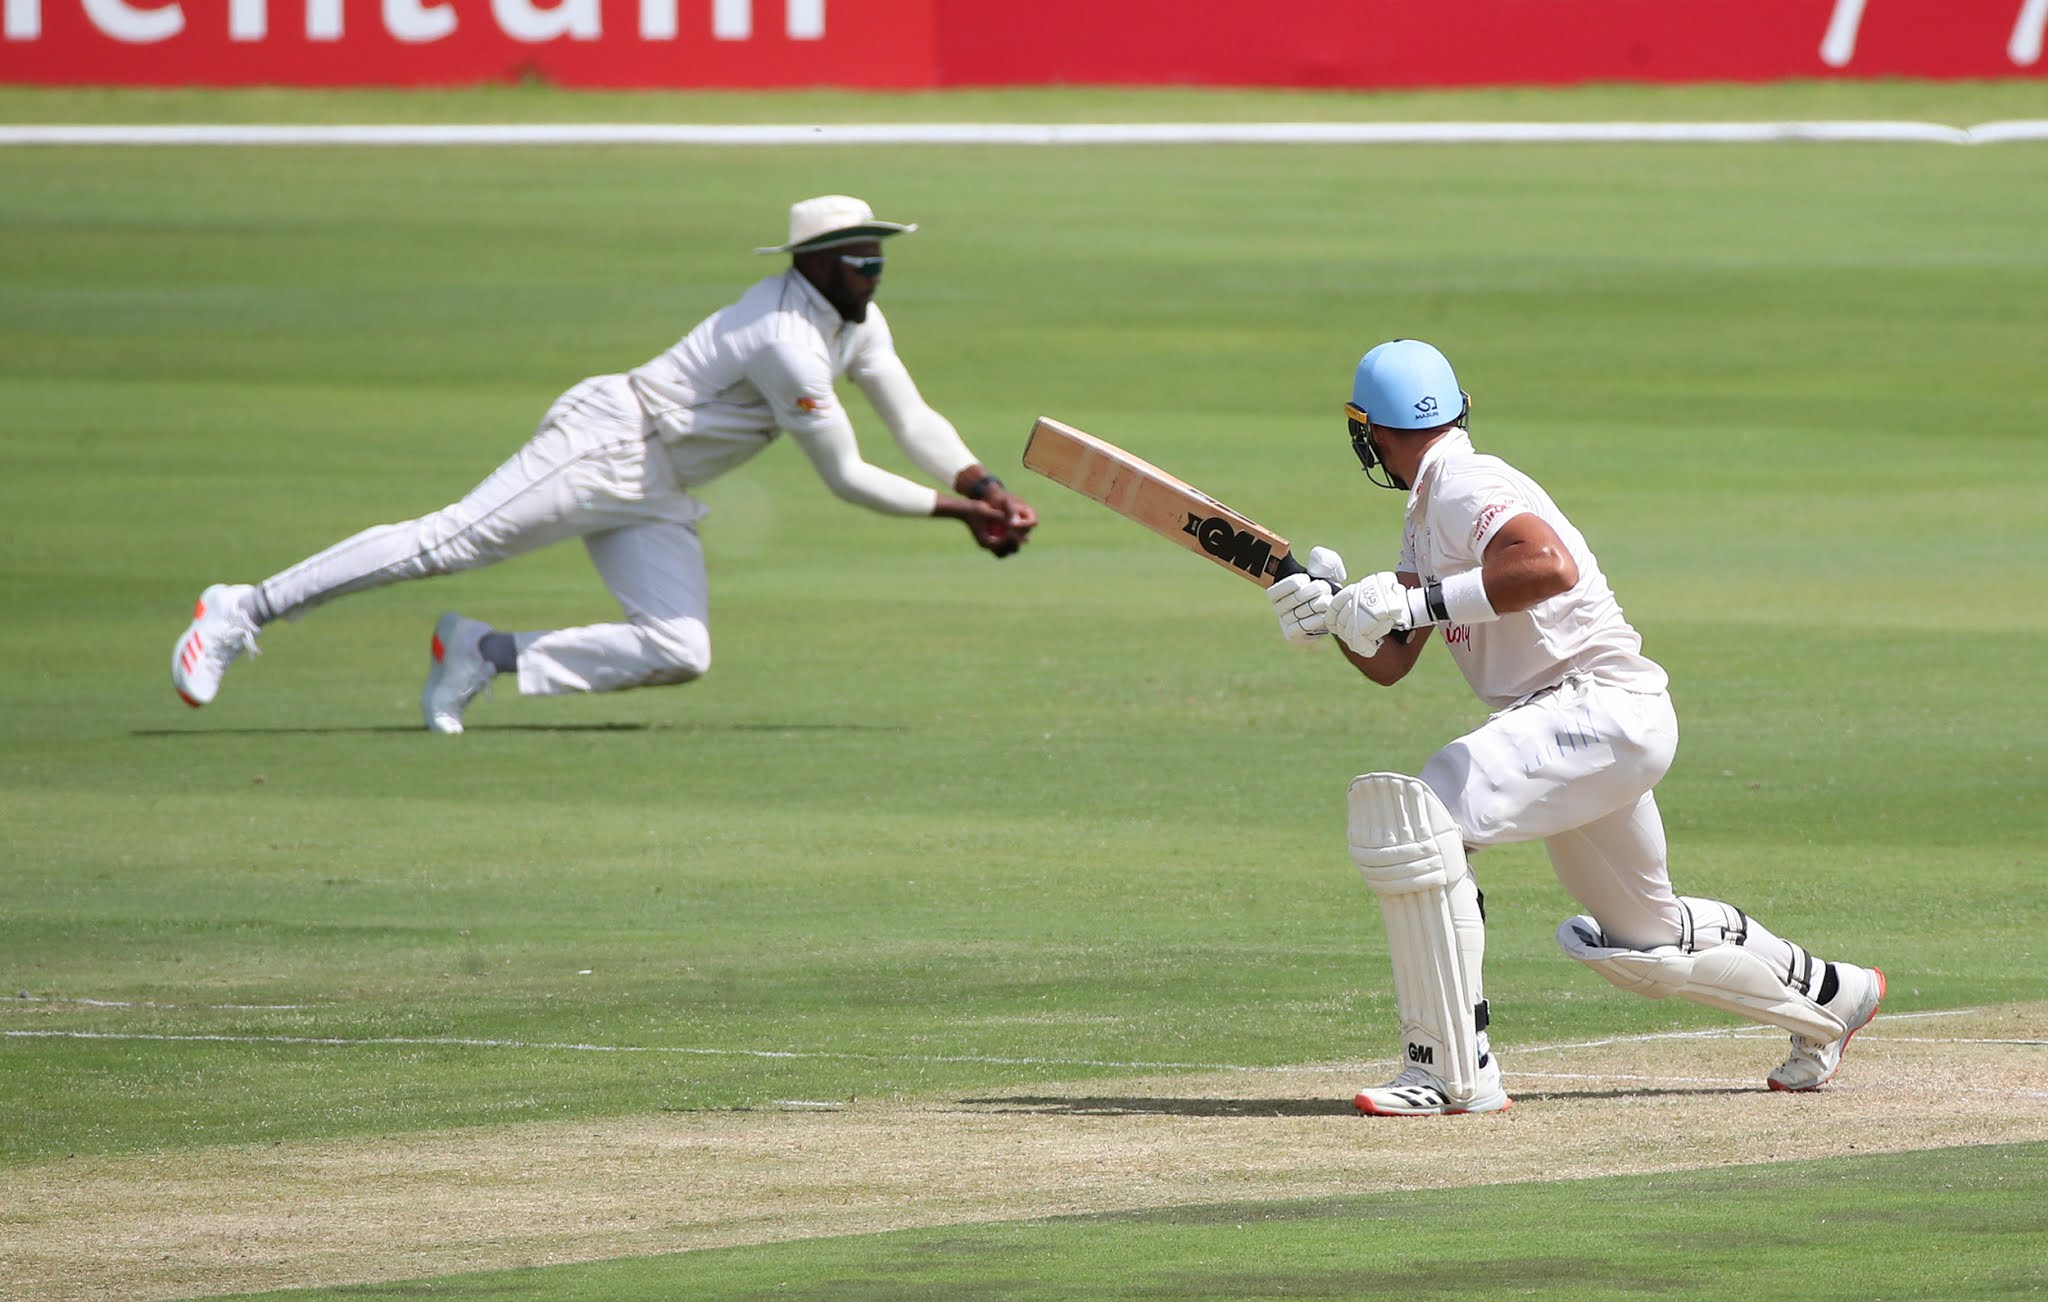 Andile Phelukwayo takes a catch